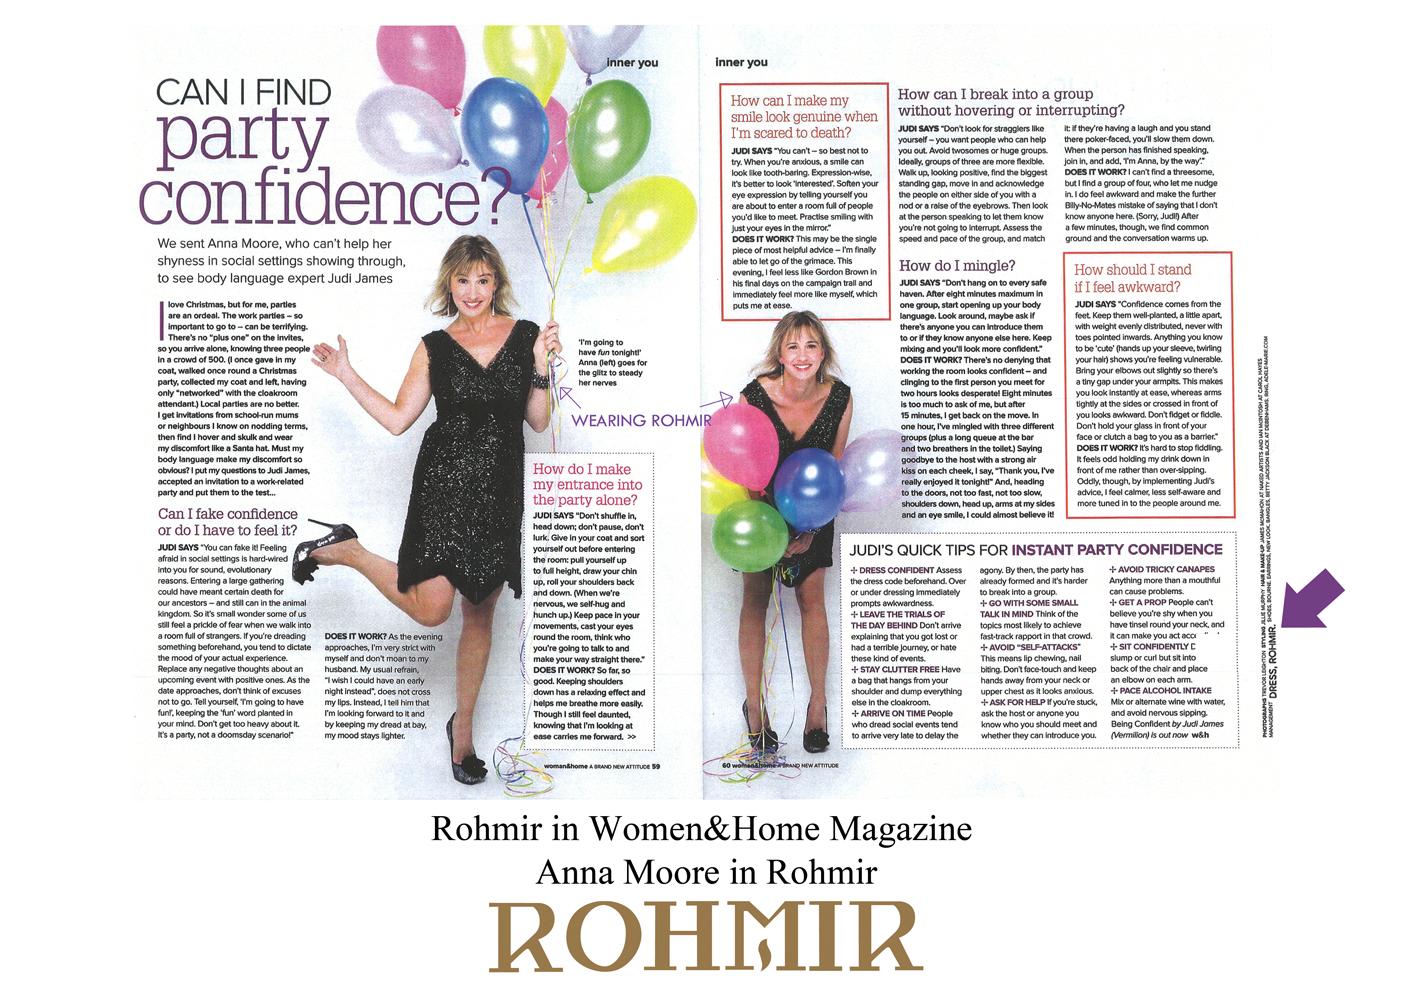 Rohmir in Women&Home Magazine Anna moore in Rohmir Dec 11